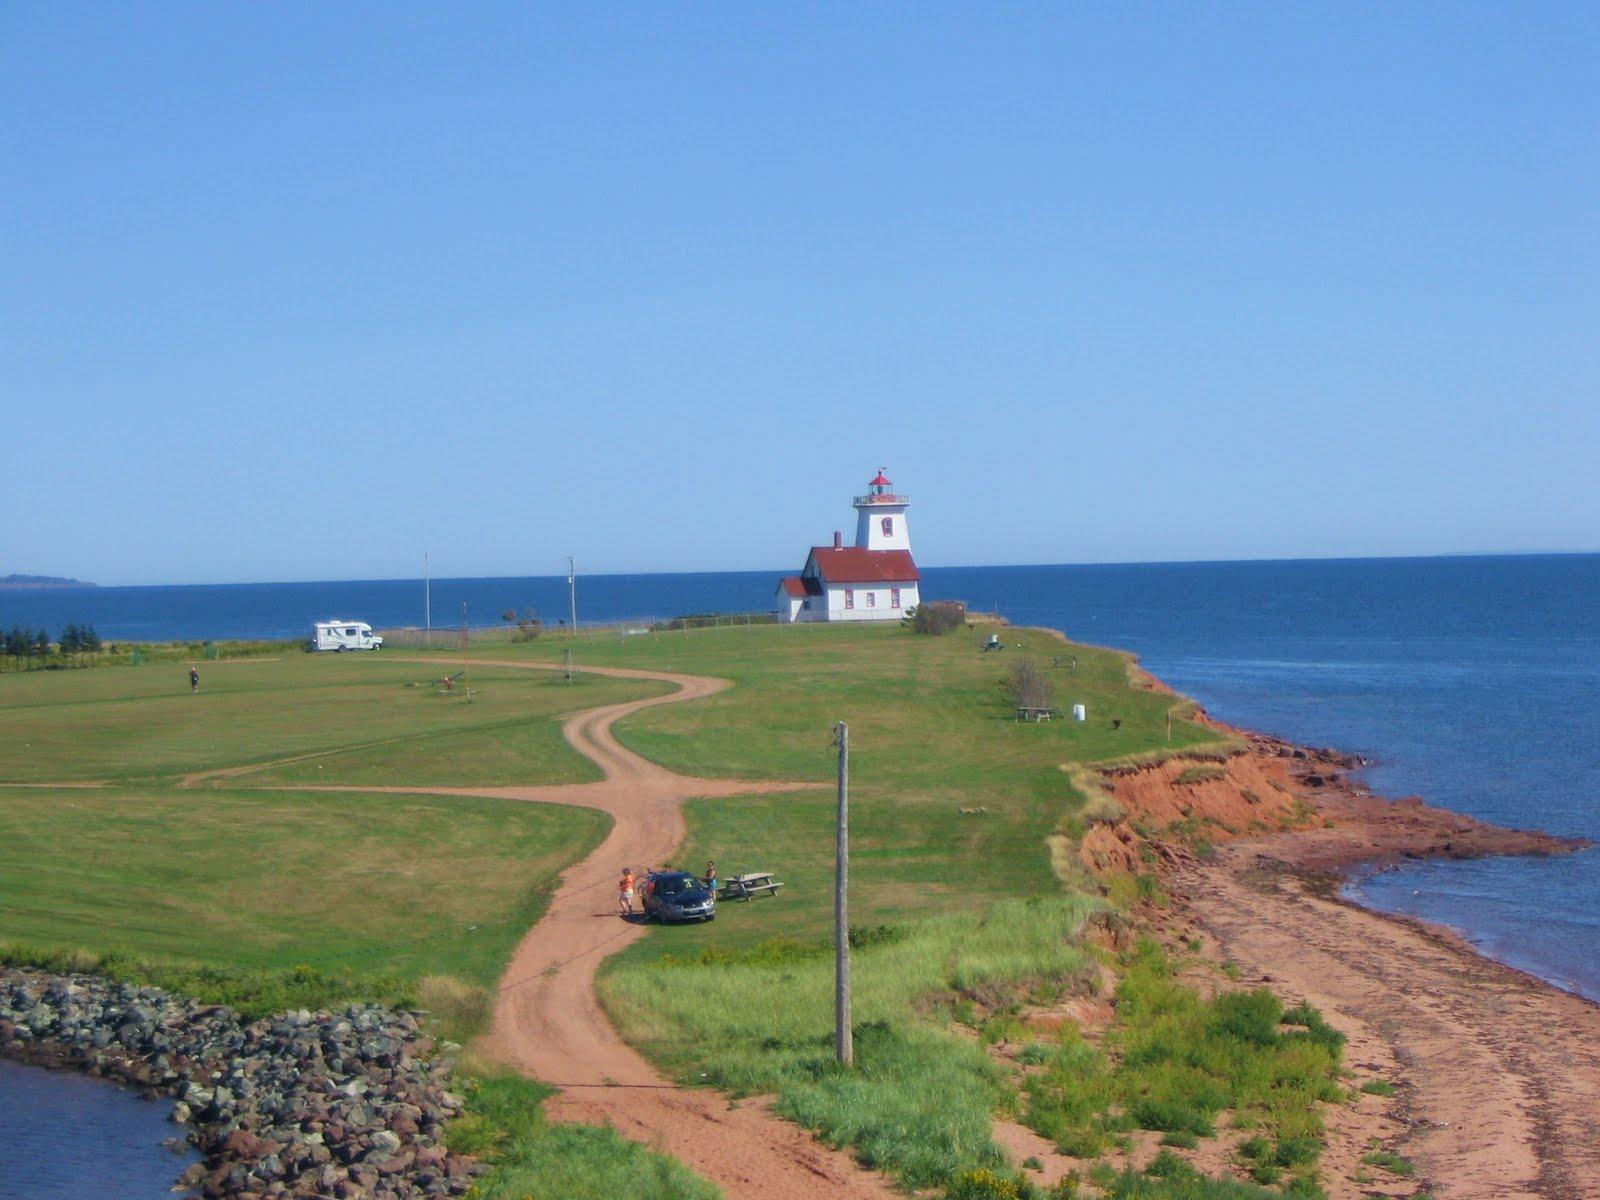 Glen St Mary Prince Edward Island Canada